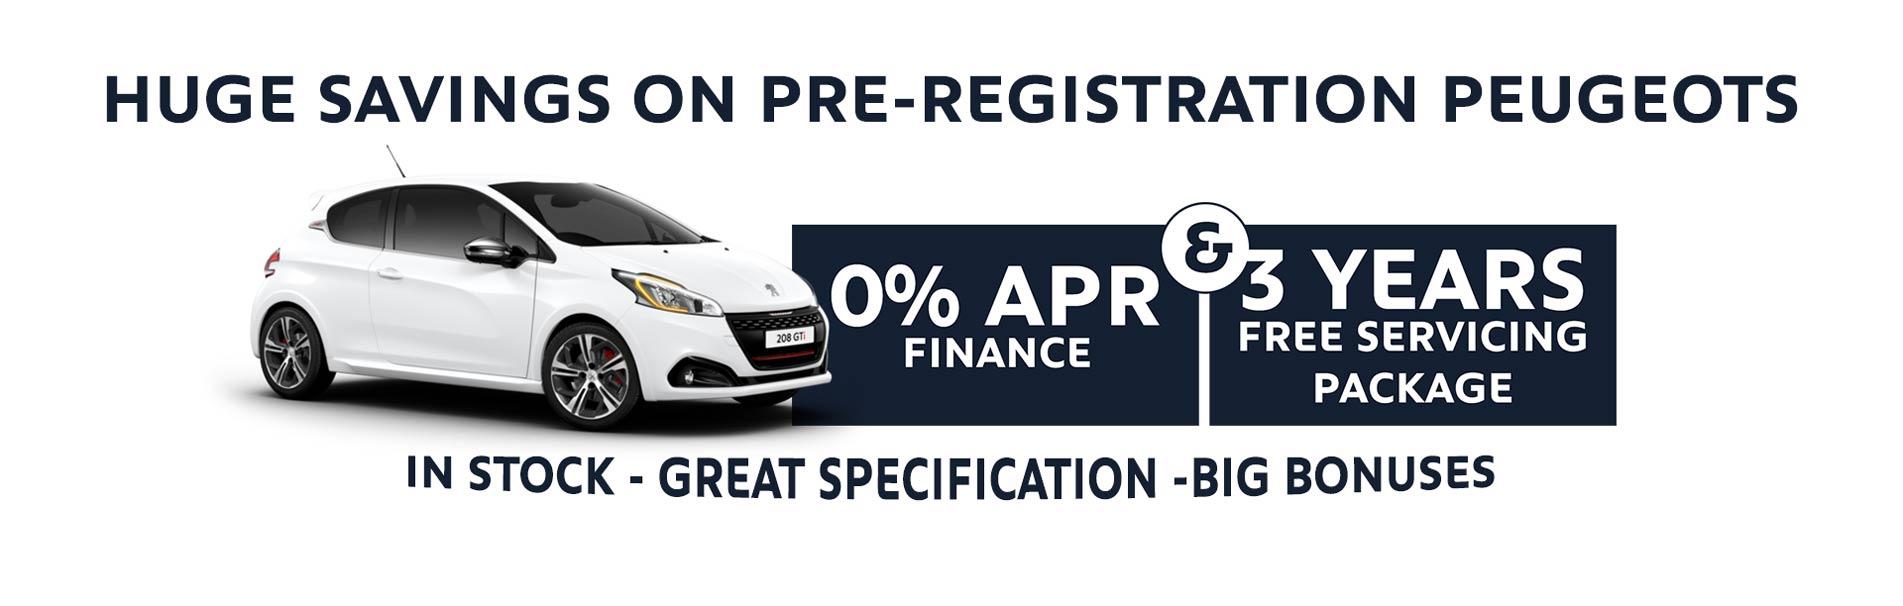 peugeot-pre-reg-car-sales-zero-percent-interest-3-years-servicing-sli